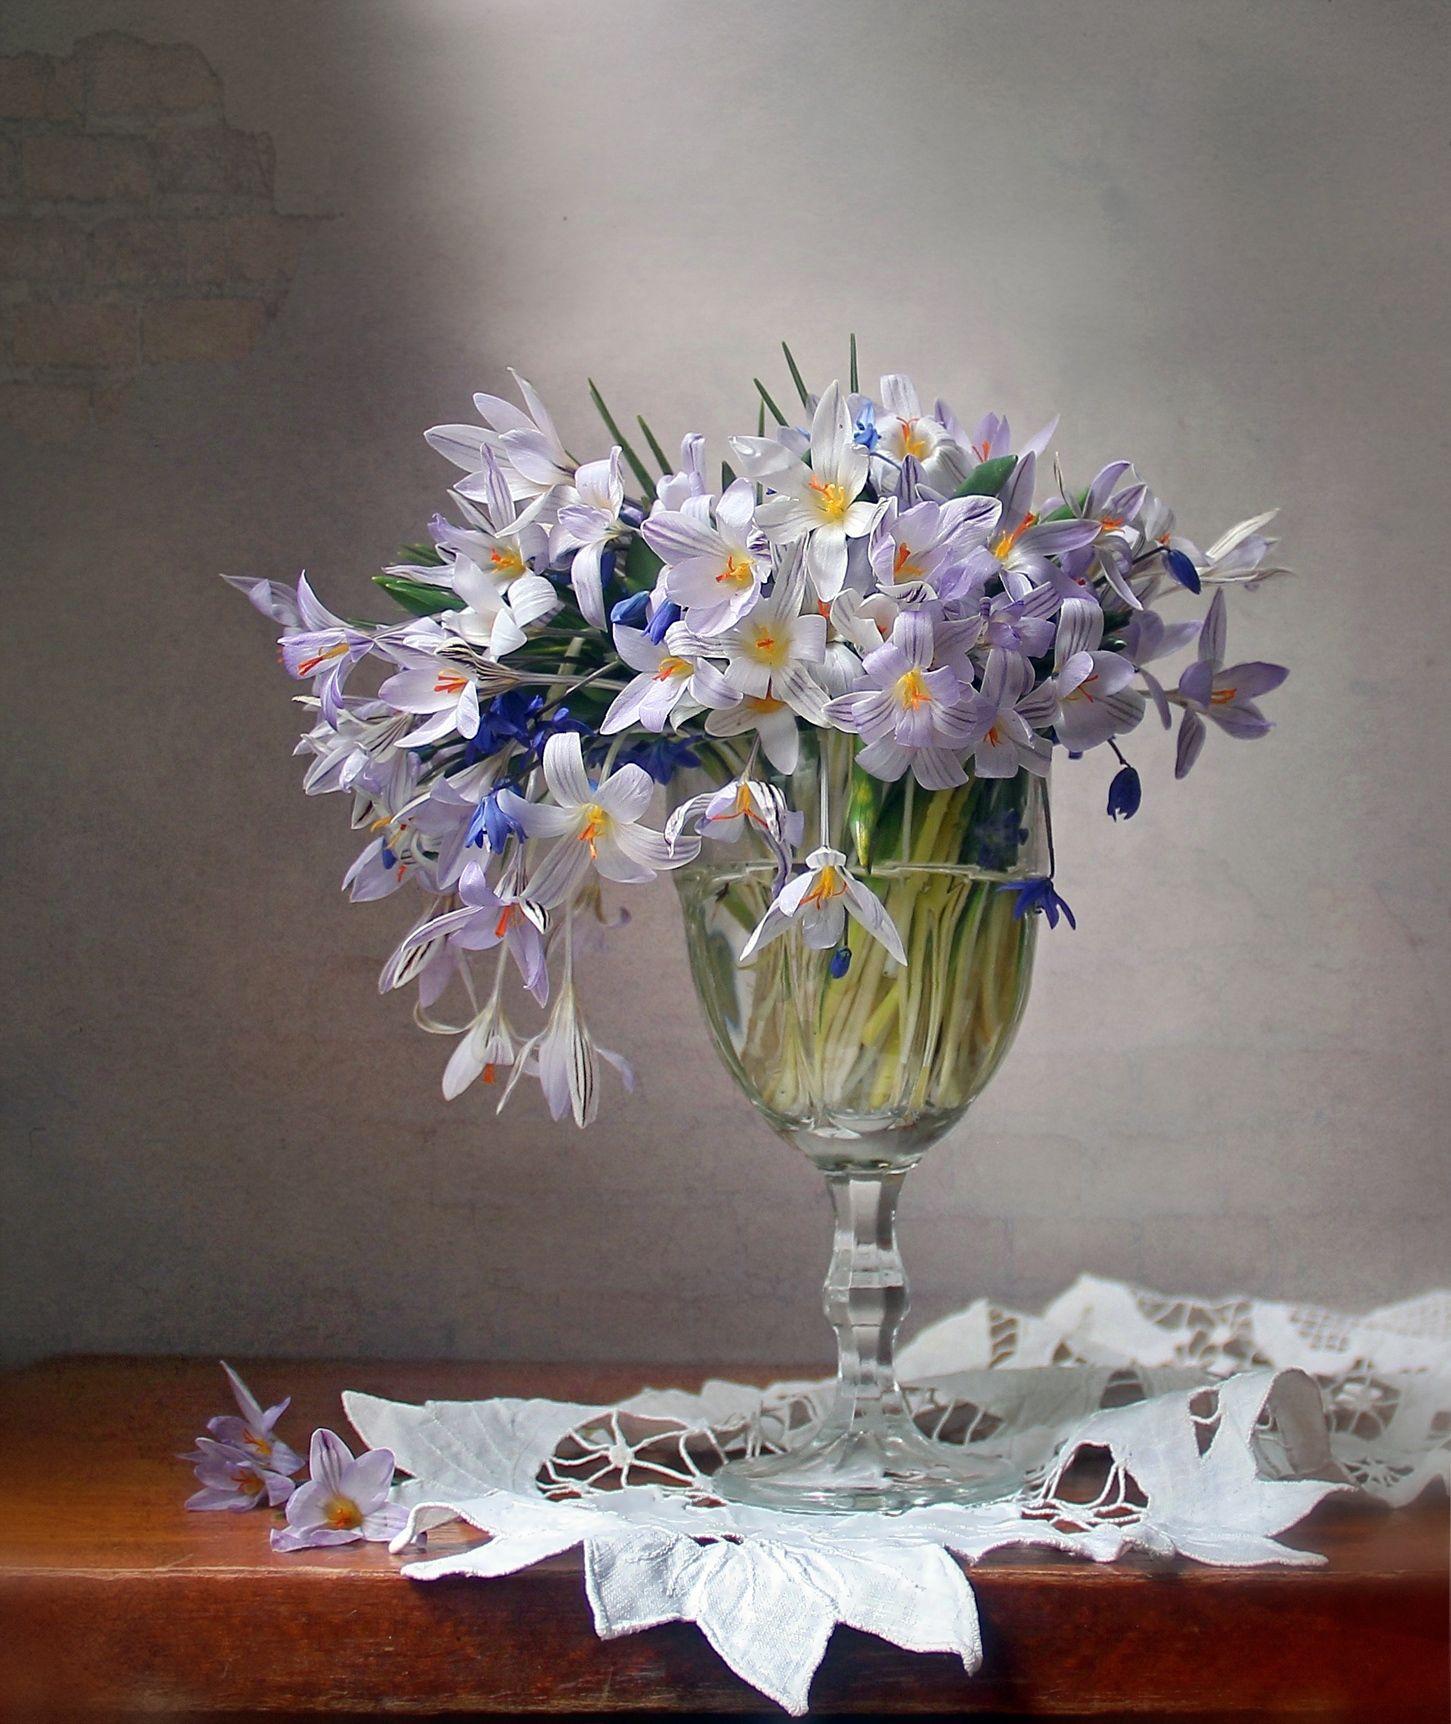 весенние первоцветы вазе фото картинки